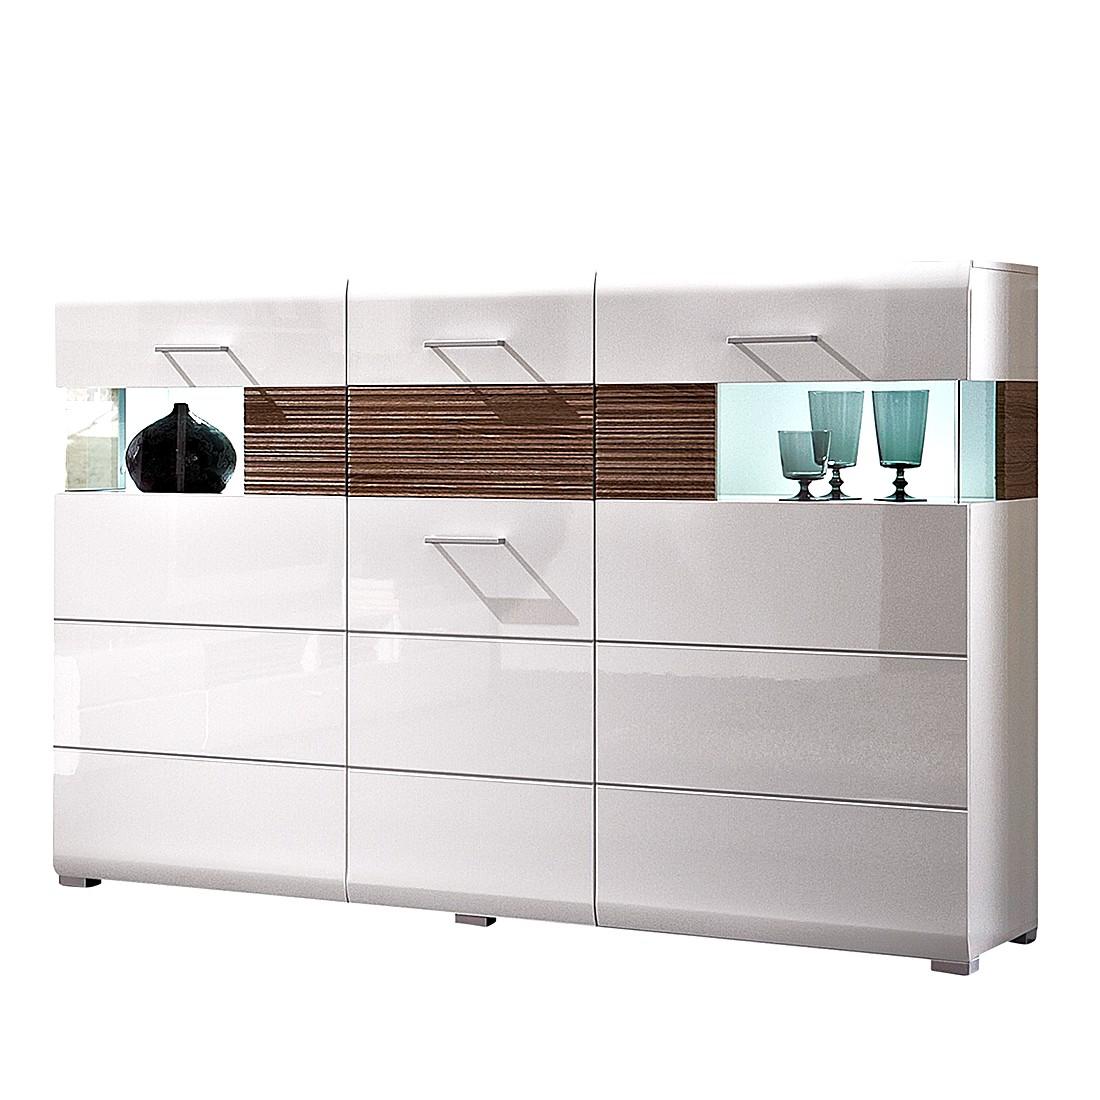 highboard weiss hochglanz preis vergleich 2016. Black Bedroom Furniture Sets. Home Design Ideas